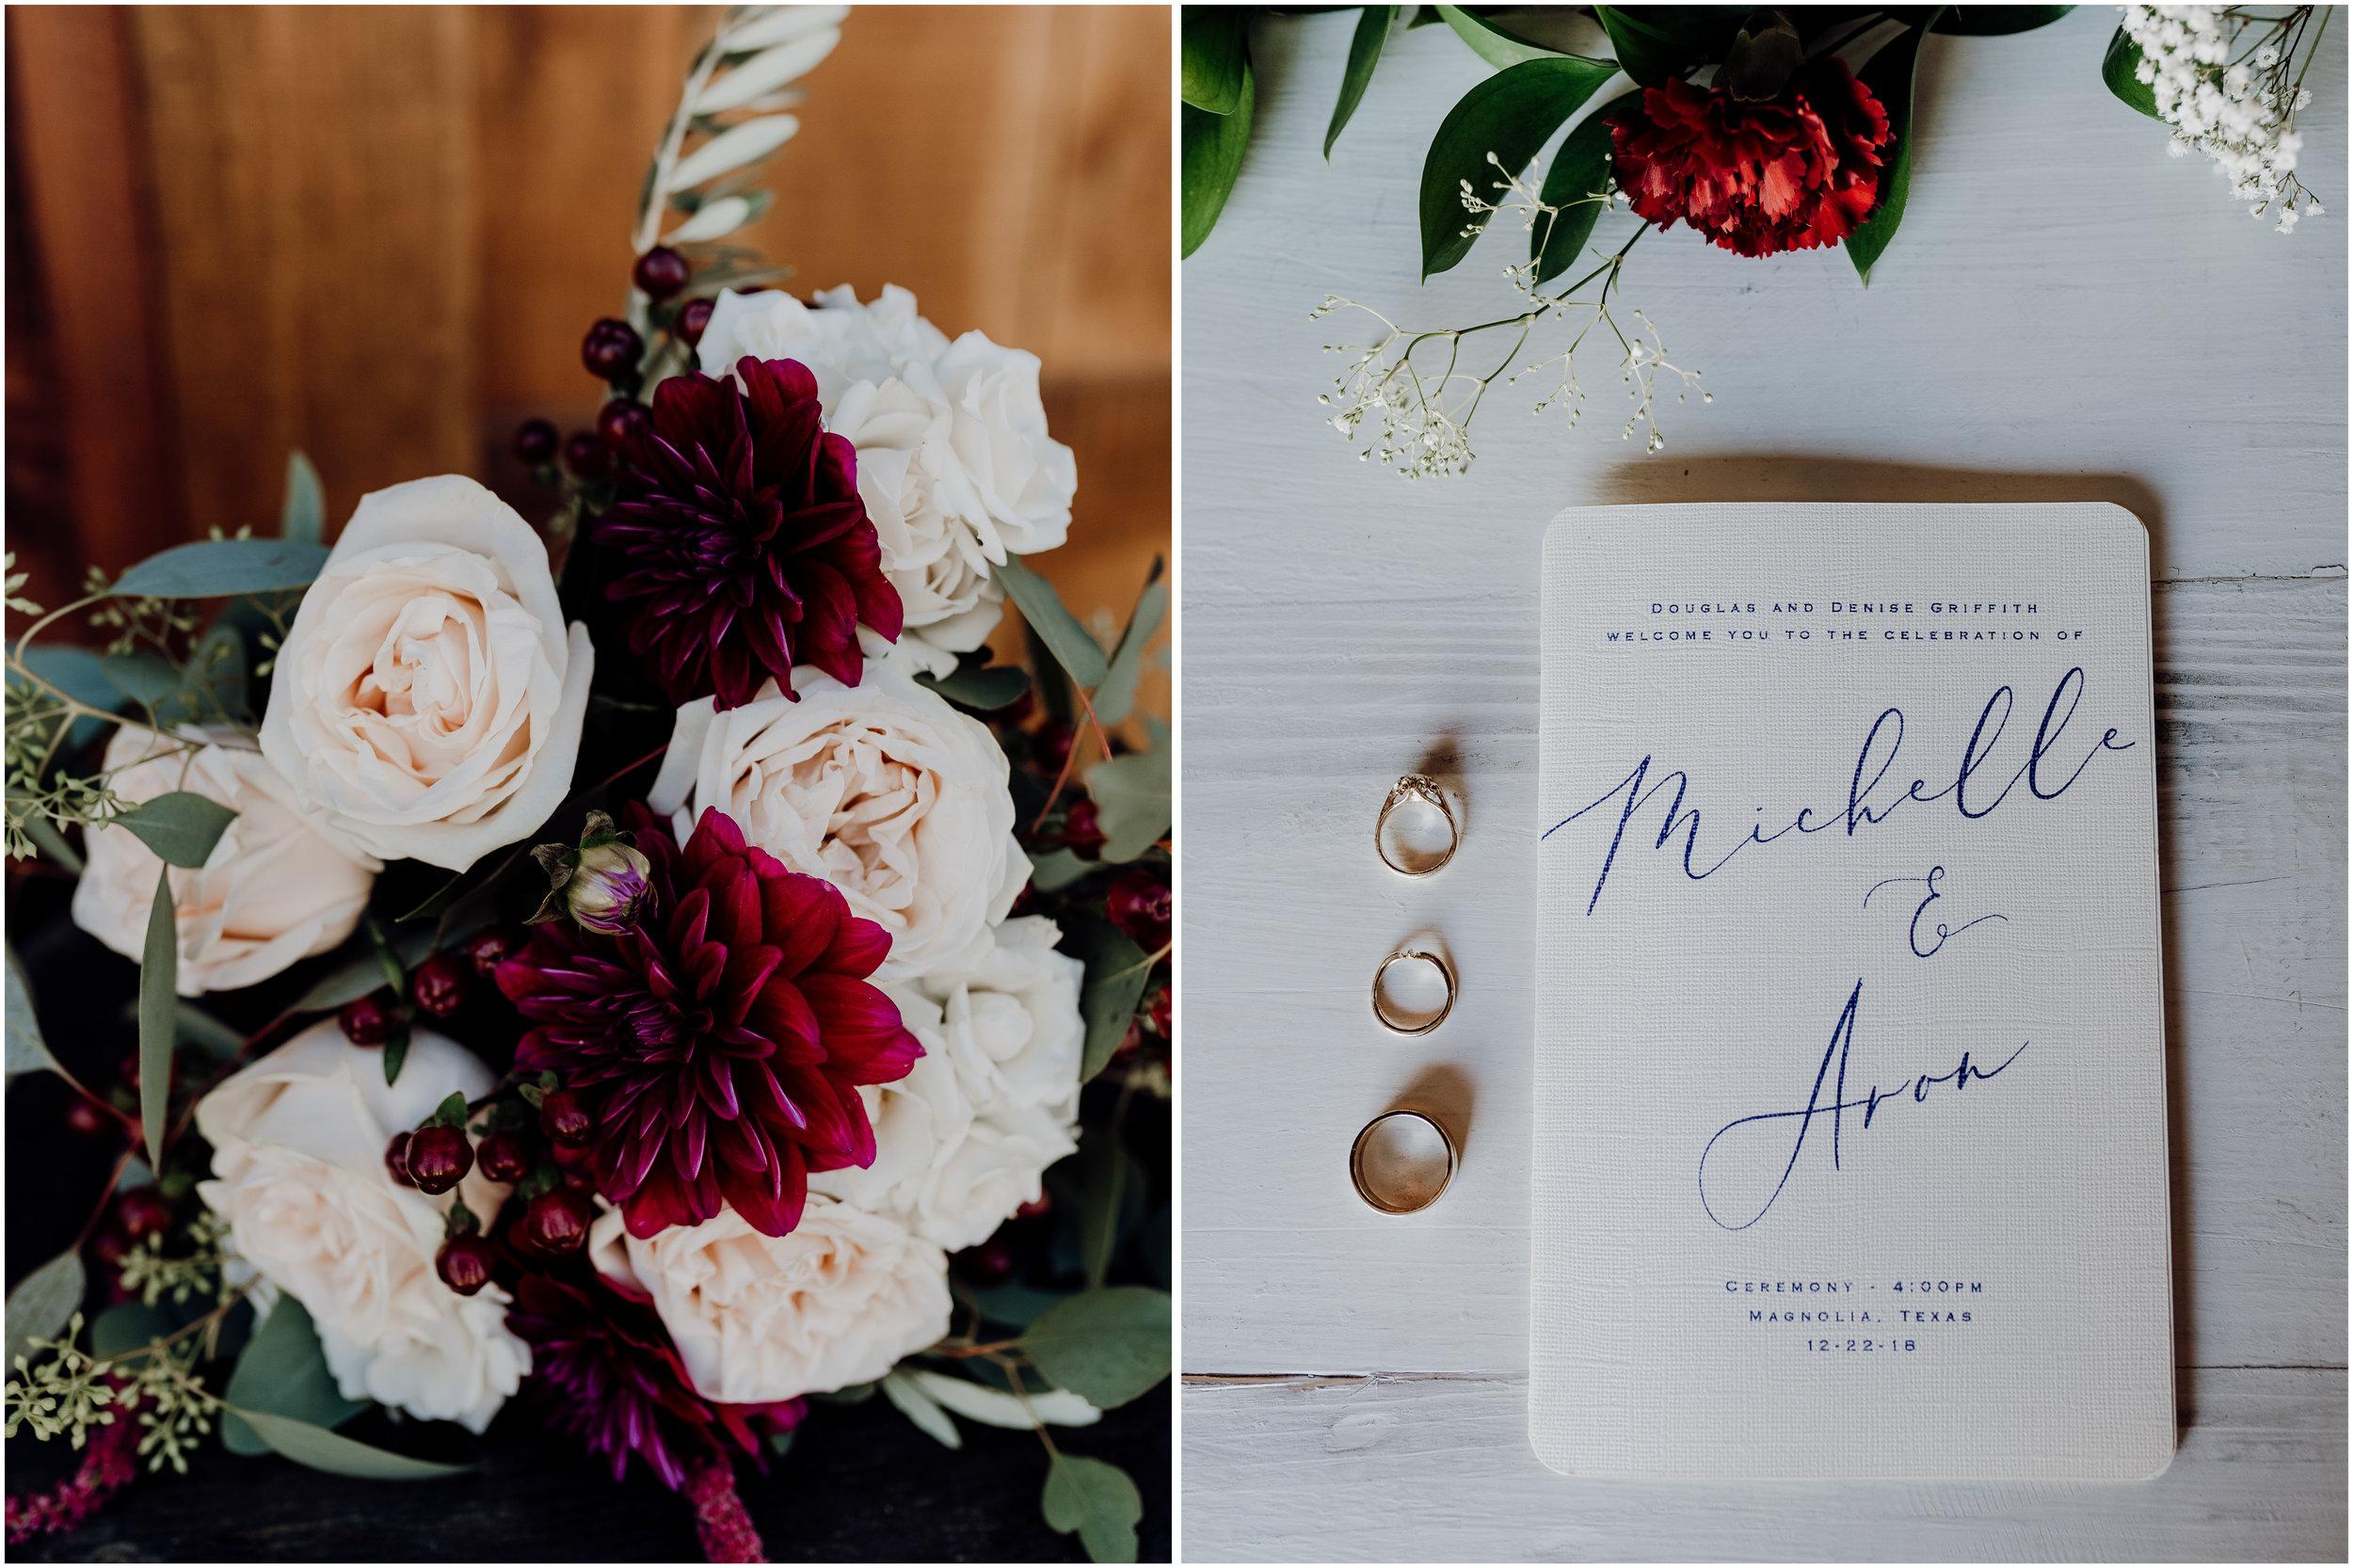 Michelle + Aron-Houston Wedding Photographer-Magnolia Meadows-Winter Wedding-01.jpg